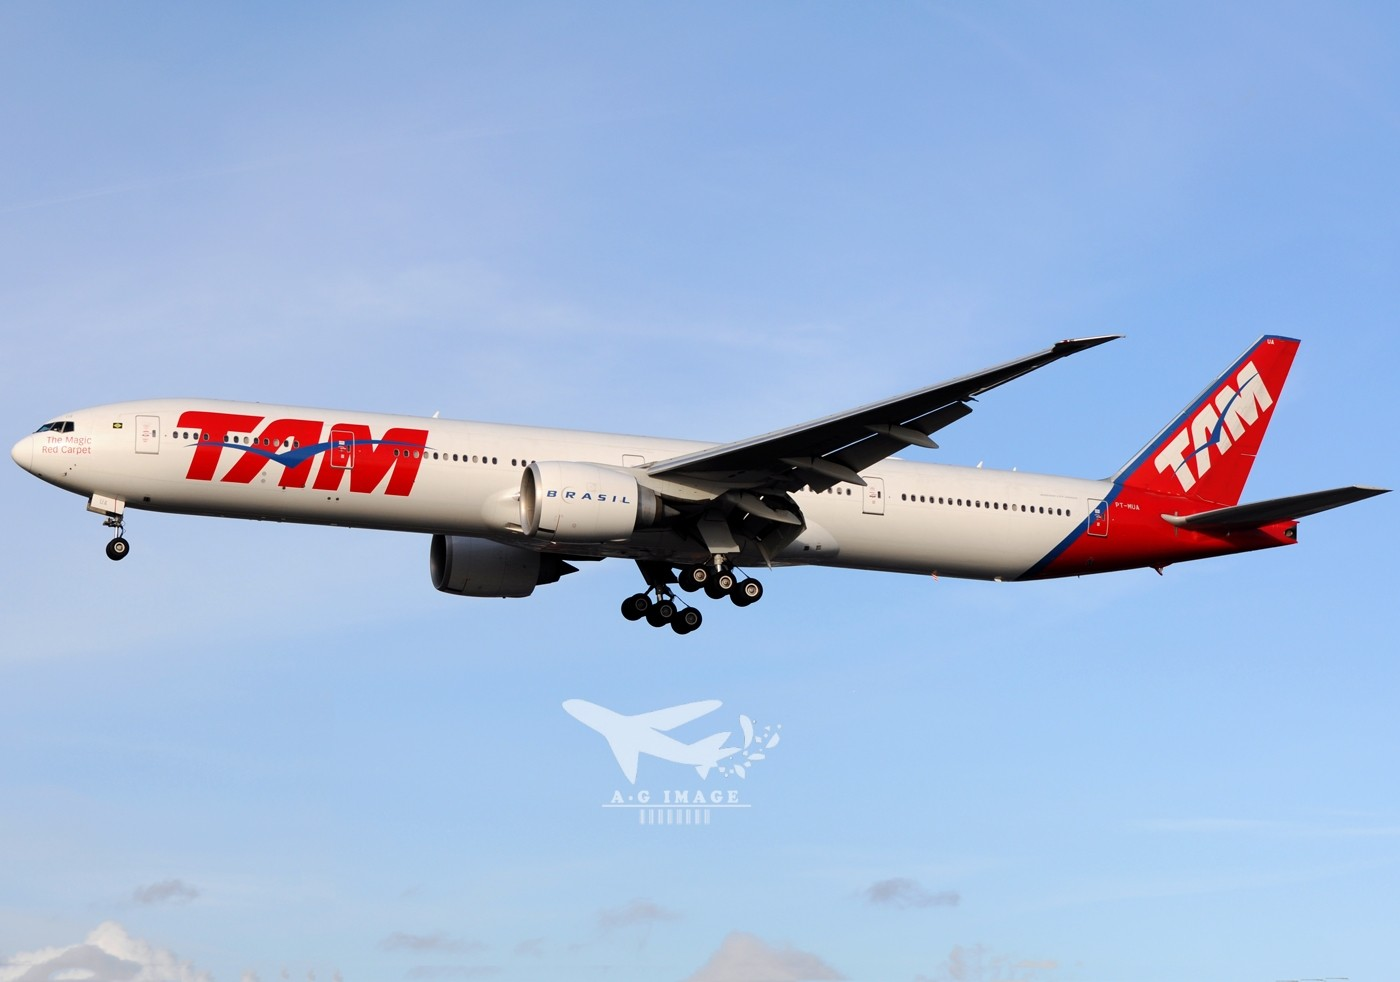 Re:[原创]【七彩天空】--八张来自LHR的77w大图,看到血脉喷张! BOEING 777-300 PT-MUA 英国伦敦希思罗机场